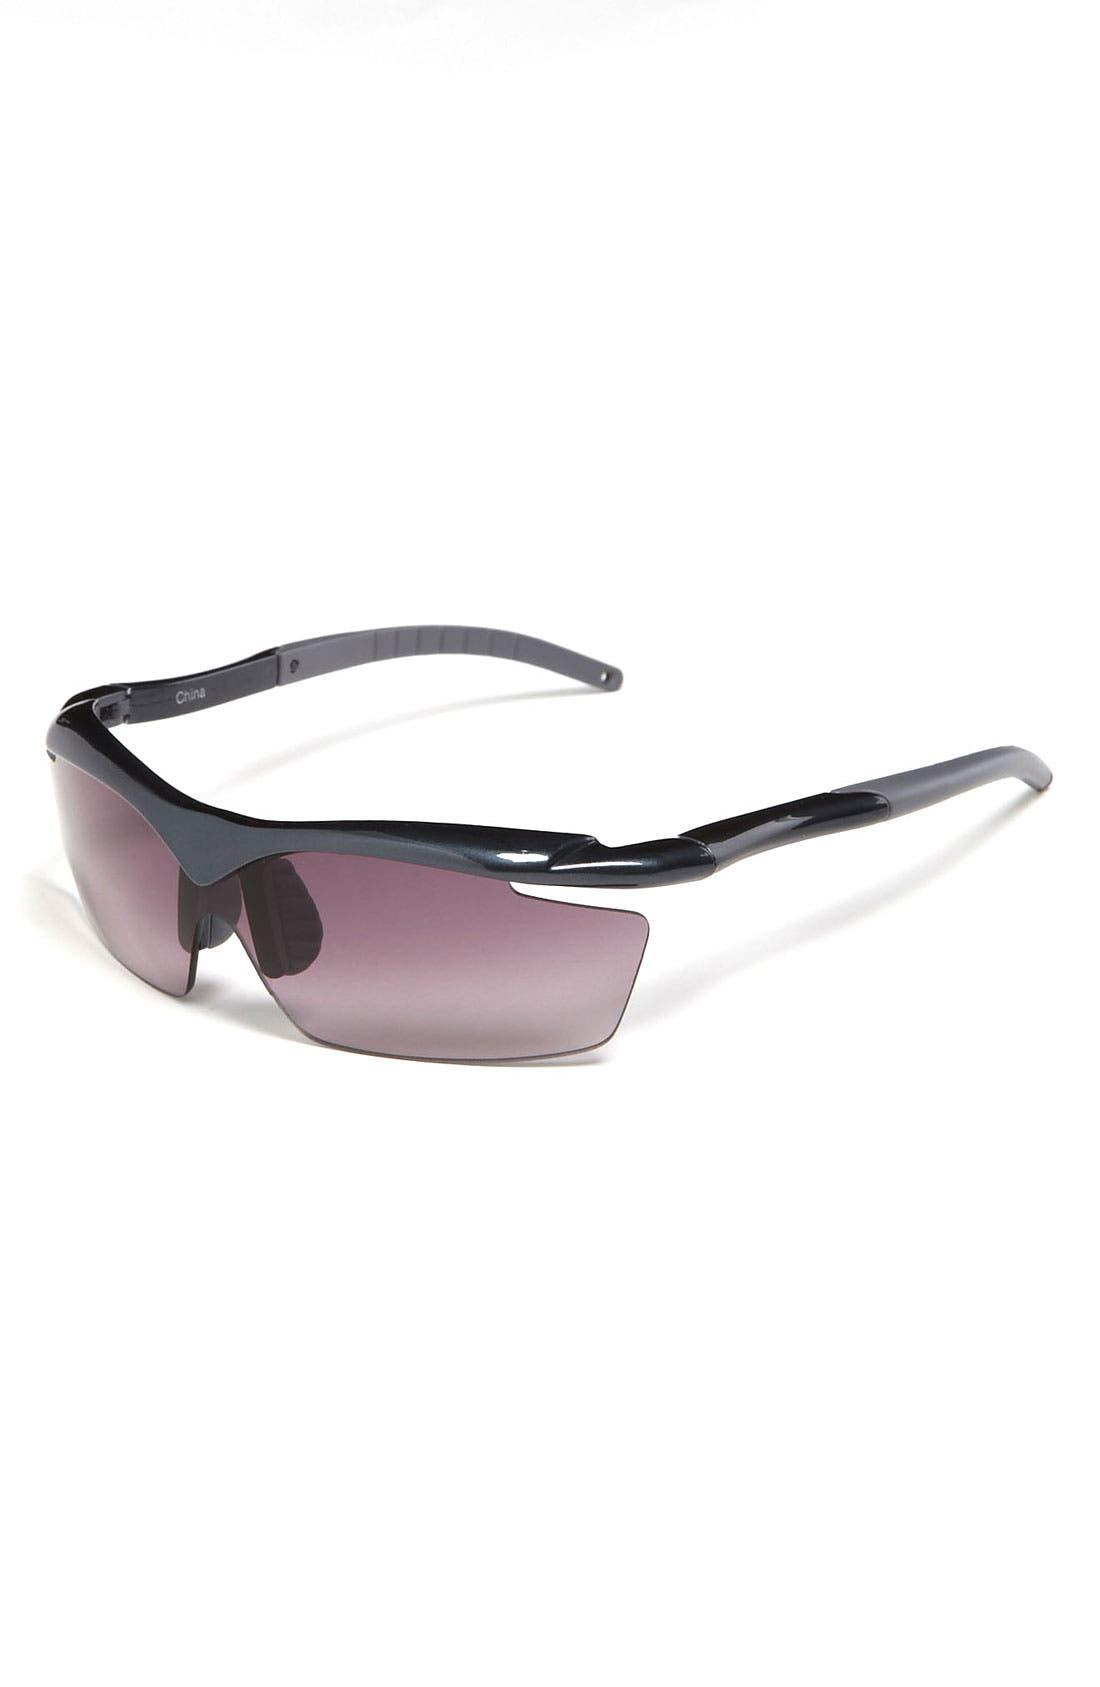 Alternate Image 1 Selected - Icon Eyewear 'Ryan' Sport Wrap Sunglasses (Big Boys)